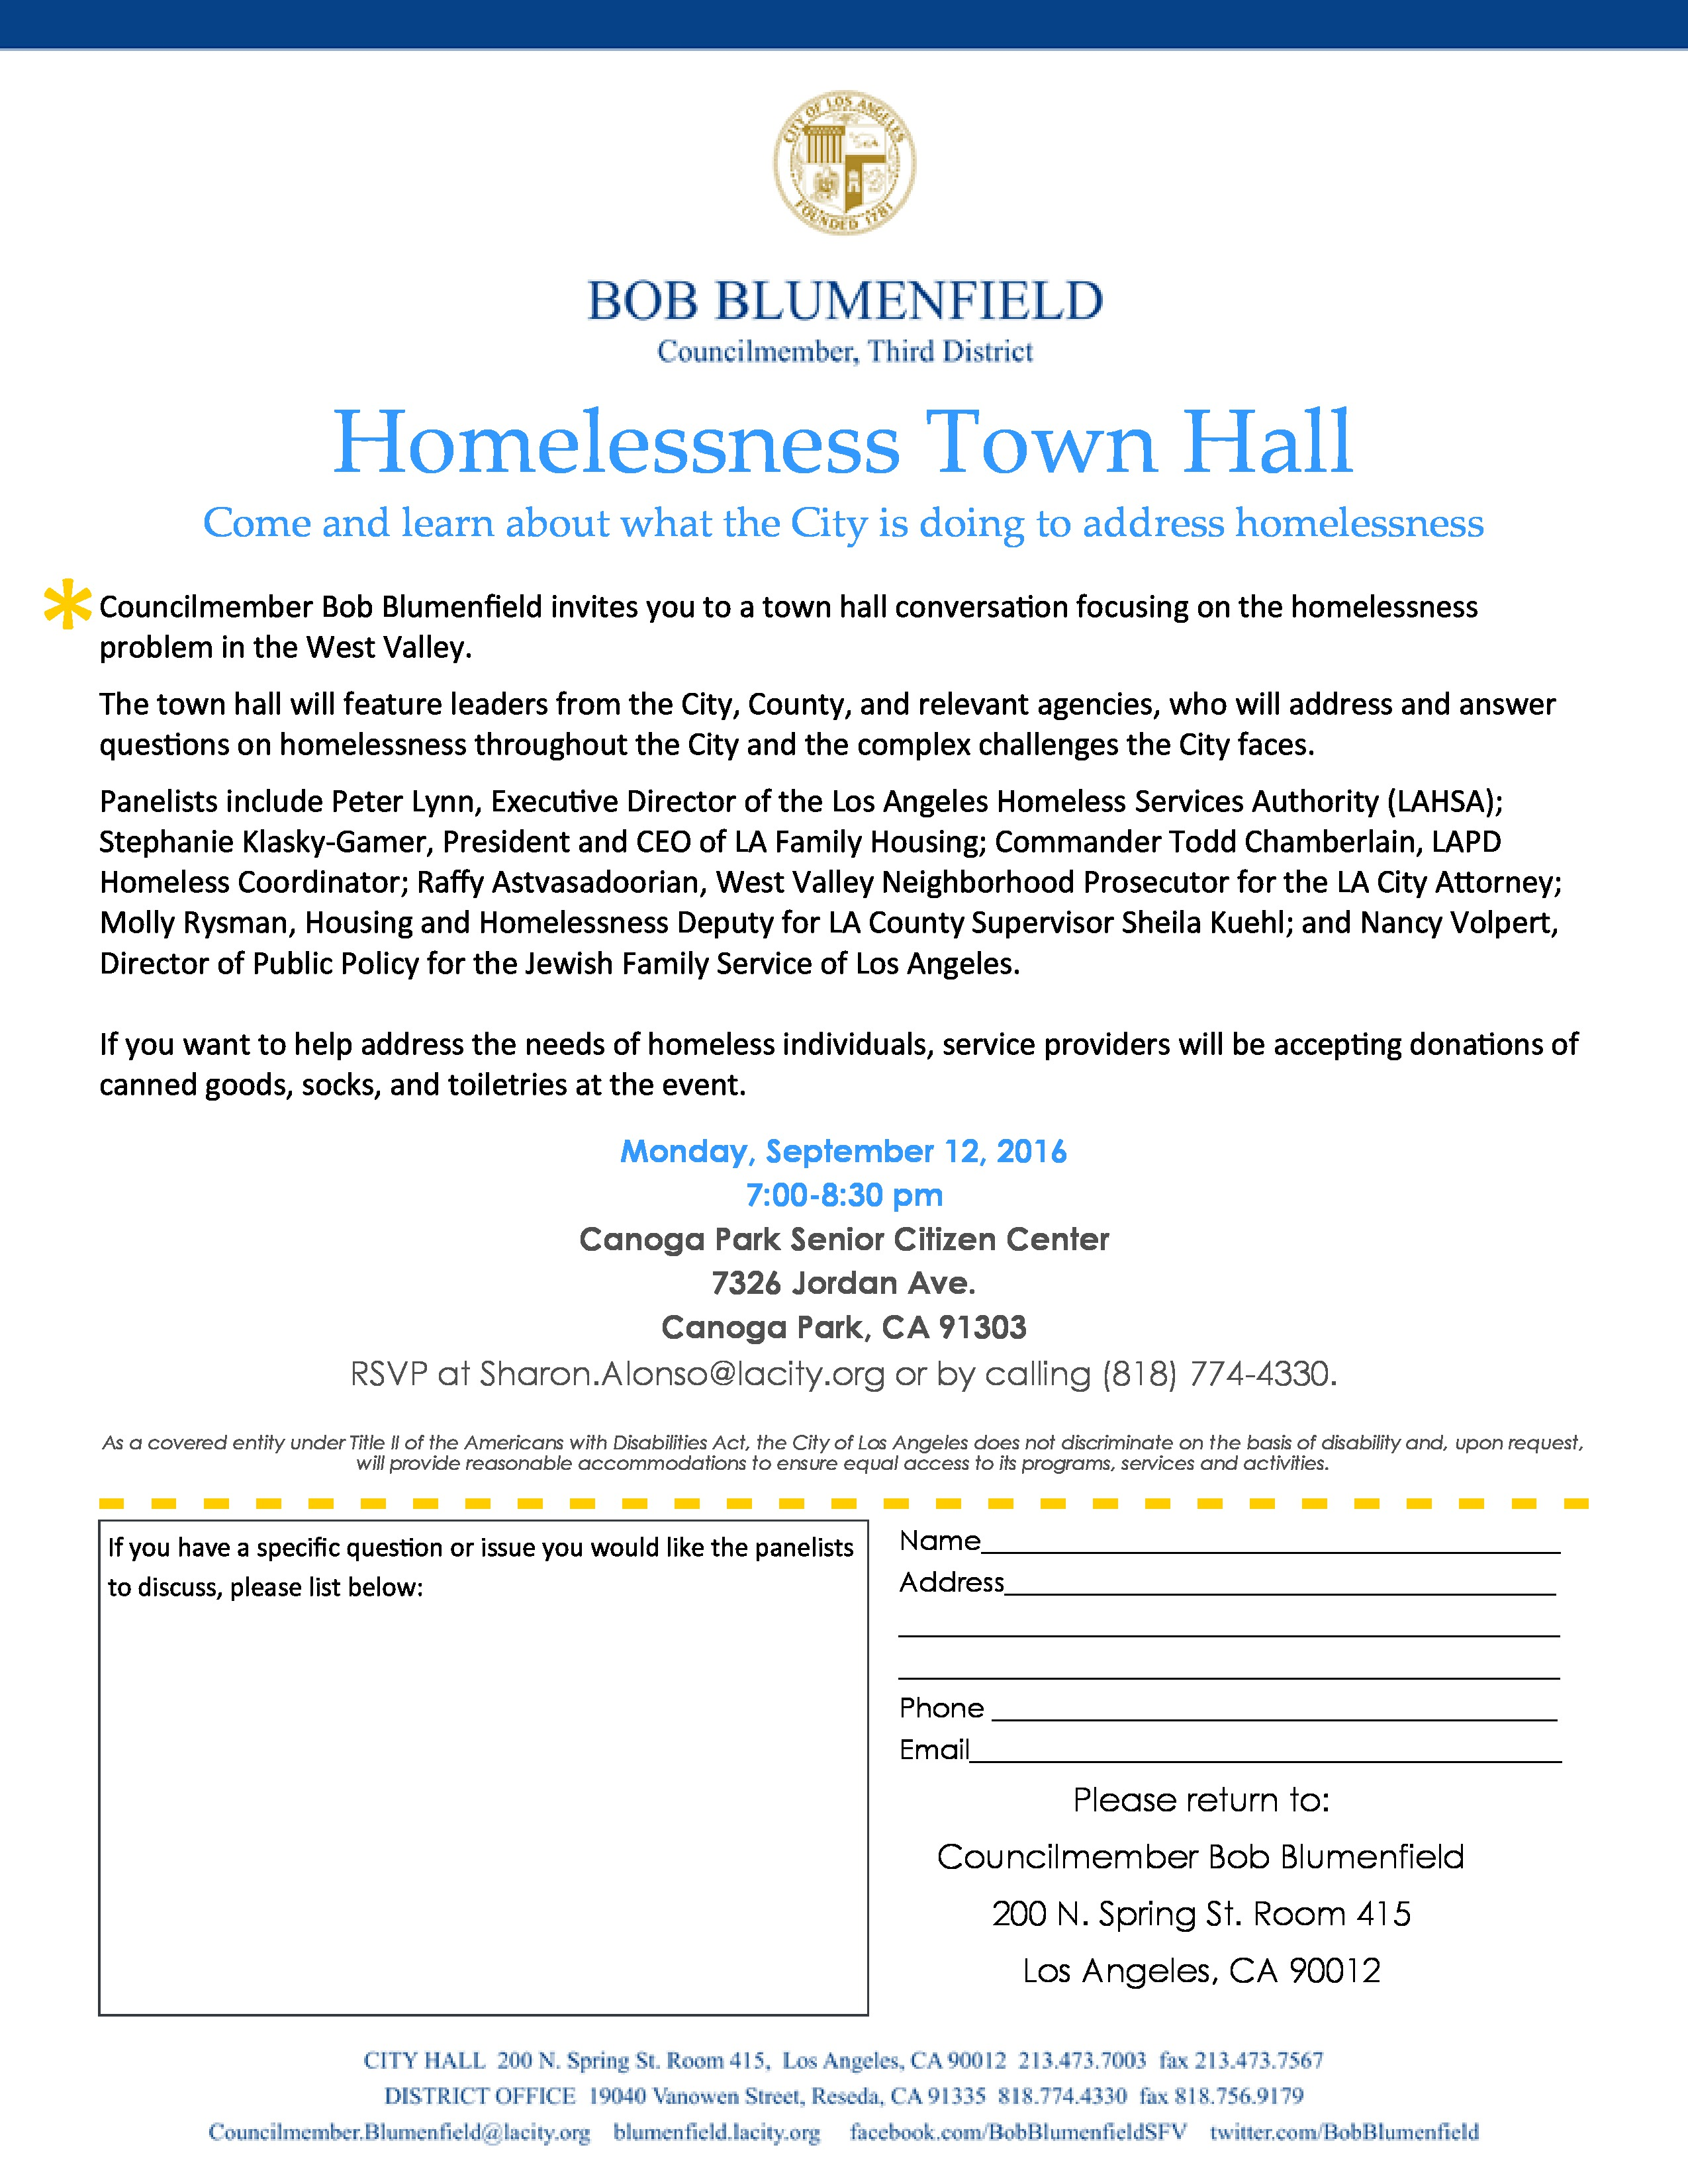 Homelessness_Town_Hall_Invite_Final-page-0_JPG.jpg